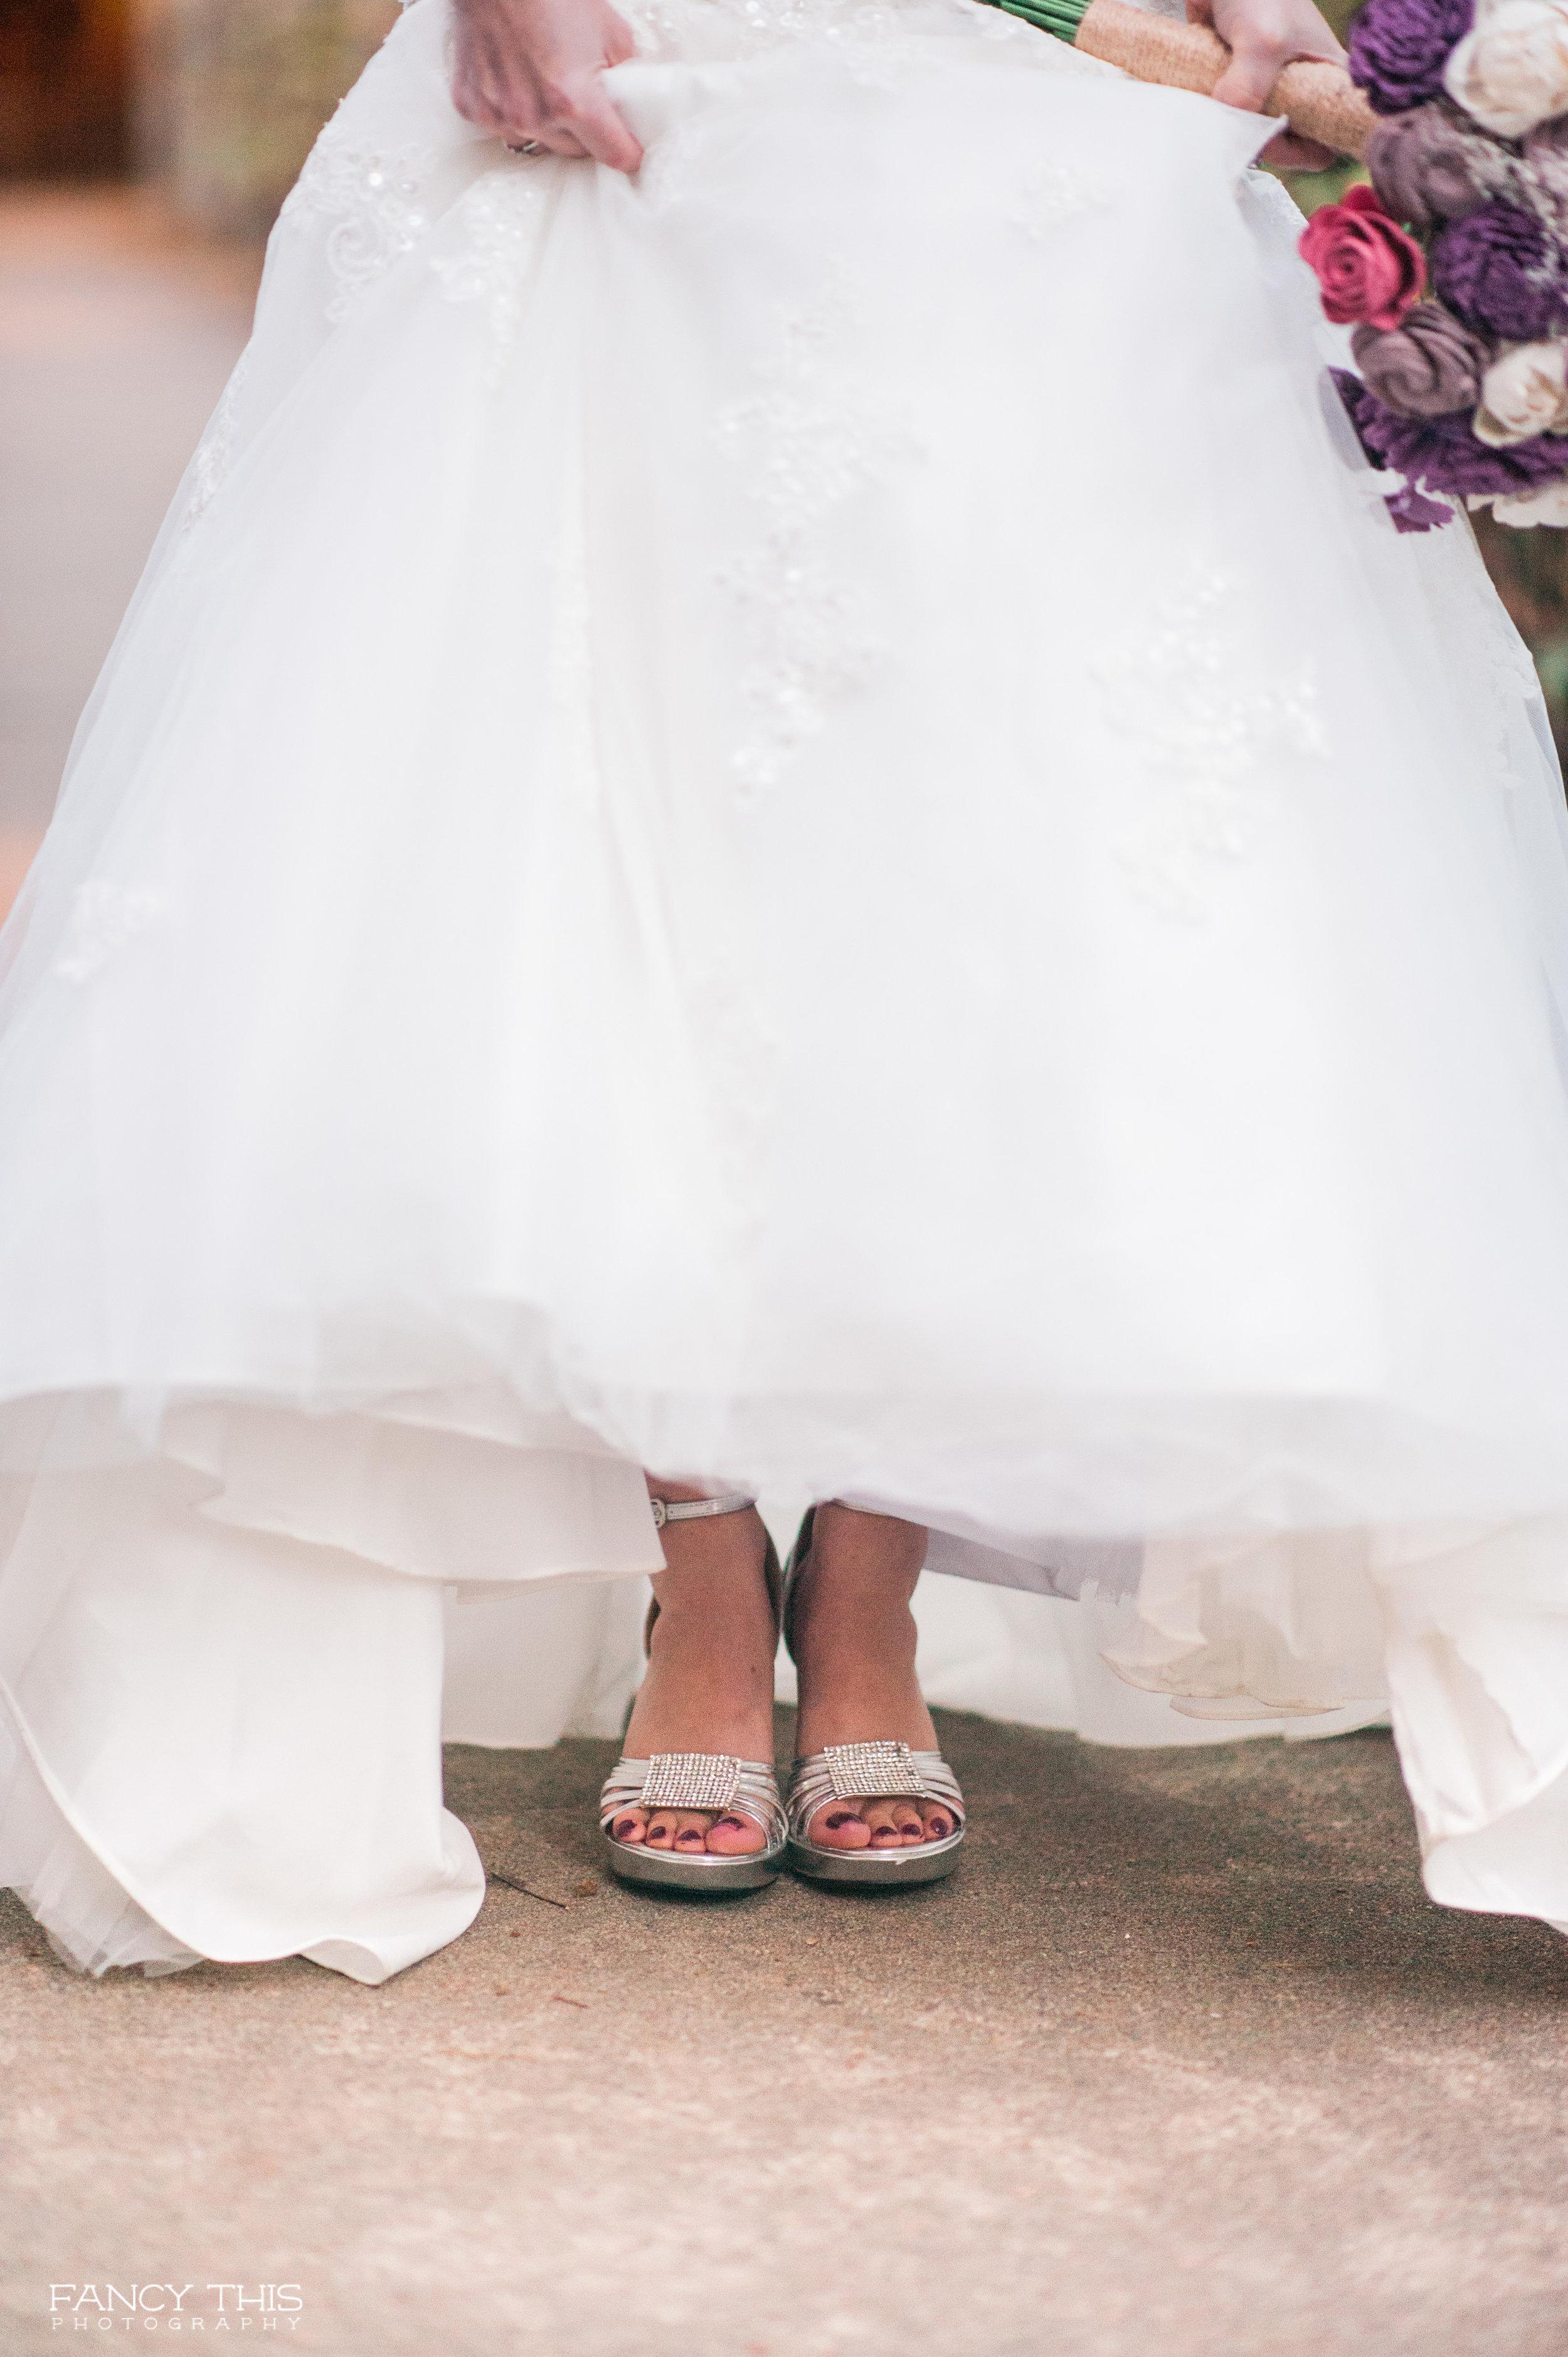 carolsimchik_bridals_socialmediaready-63.jpg